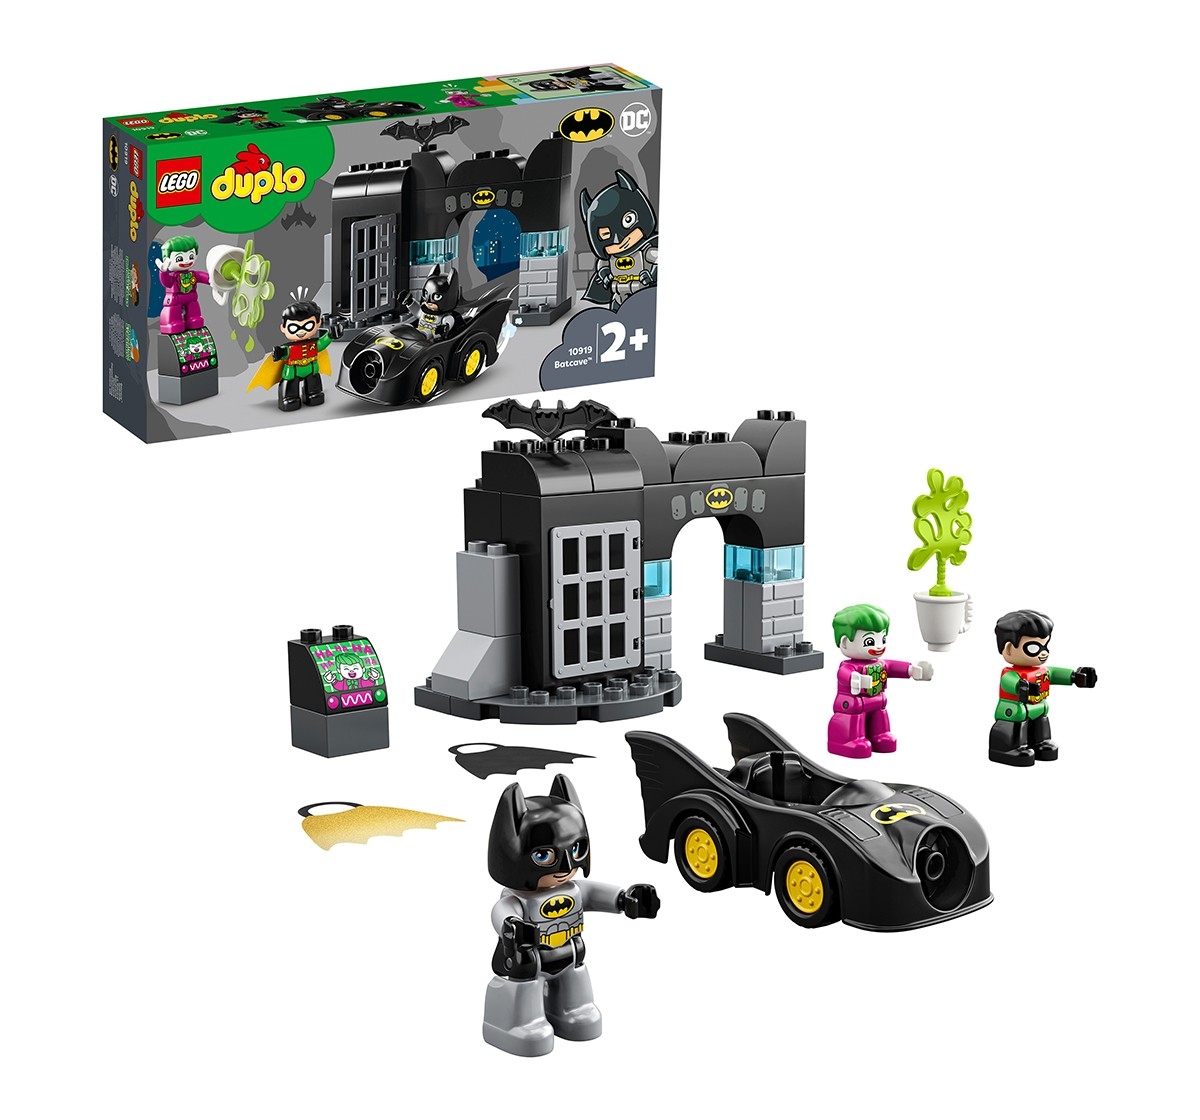 LEGO 10919 Batcave™ Building Block Set Lego Blocks for Kids age 2Y+